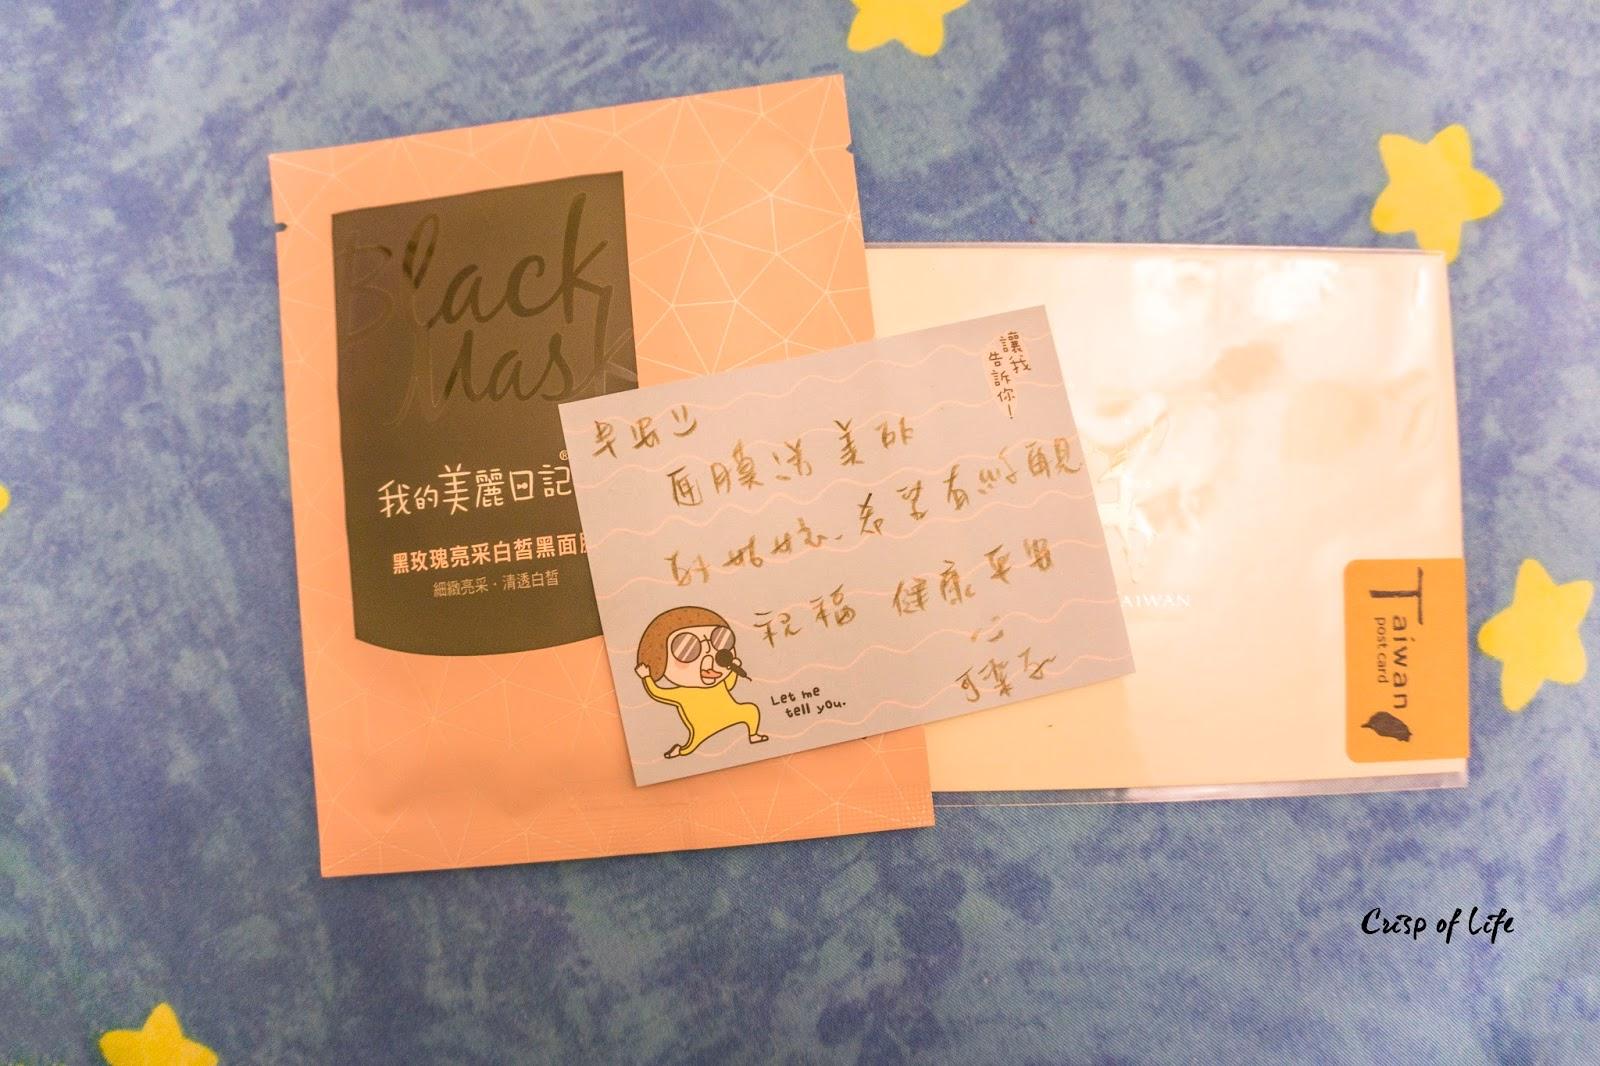 [HUALIEN 花莲] Happy House+ Homestay 第六天:花莲民宿 - 可乐+民宿